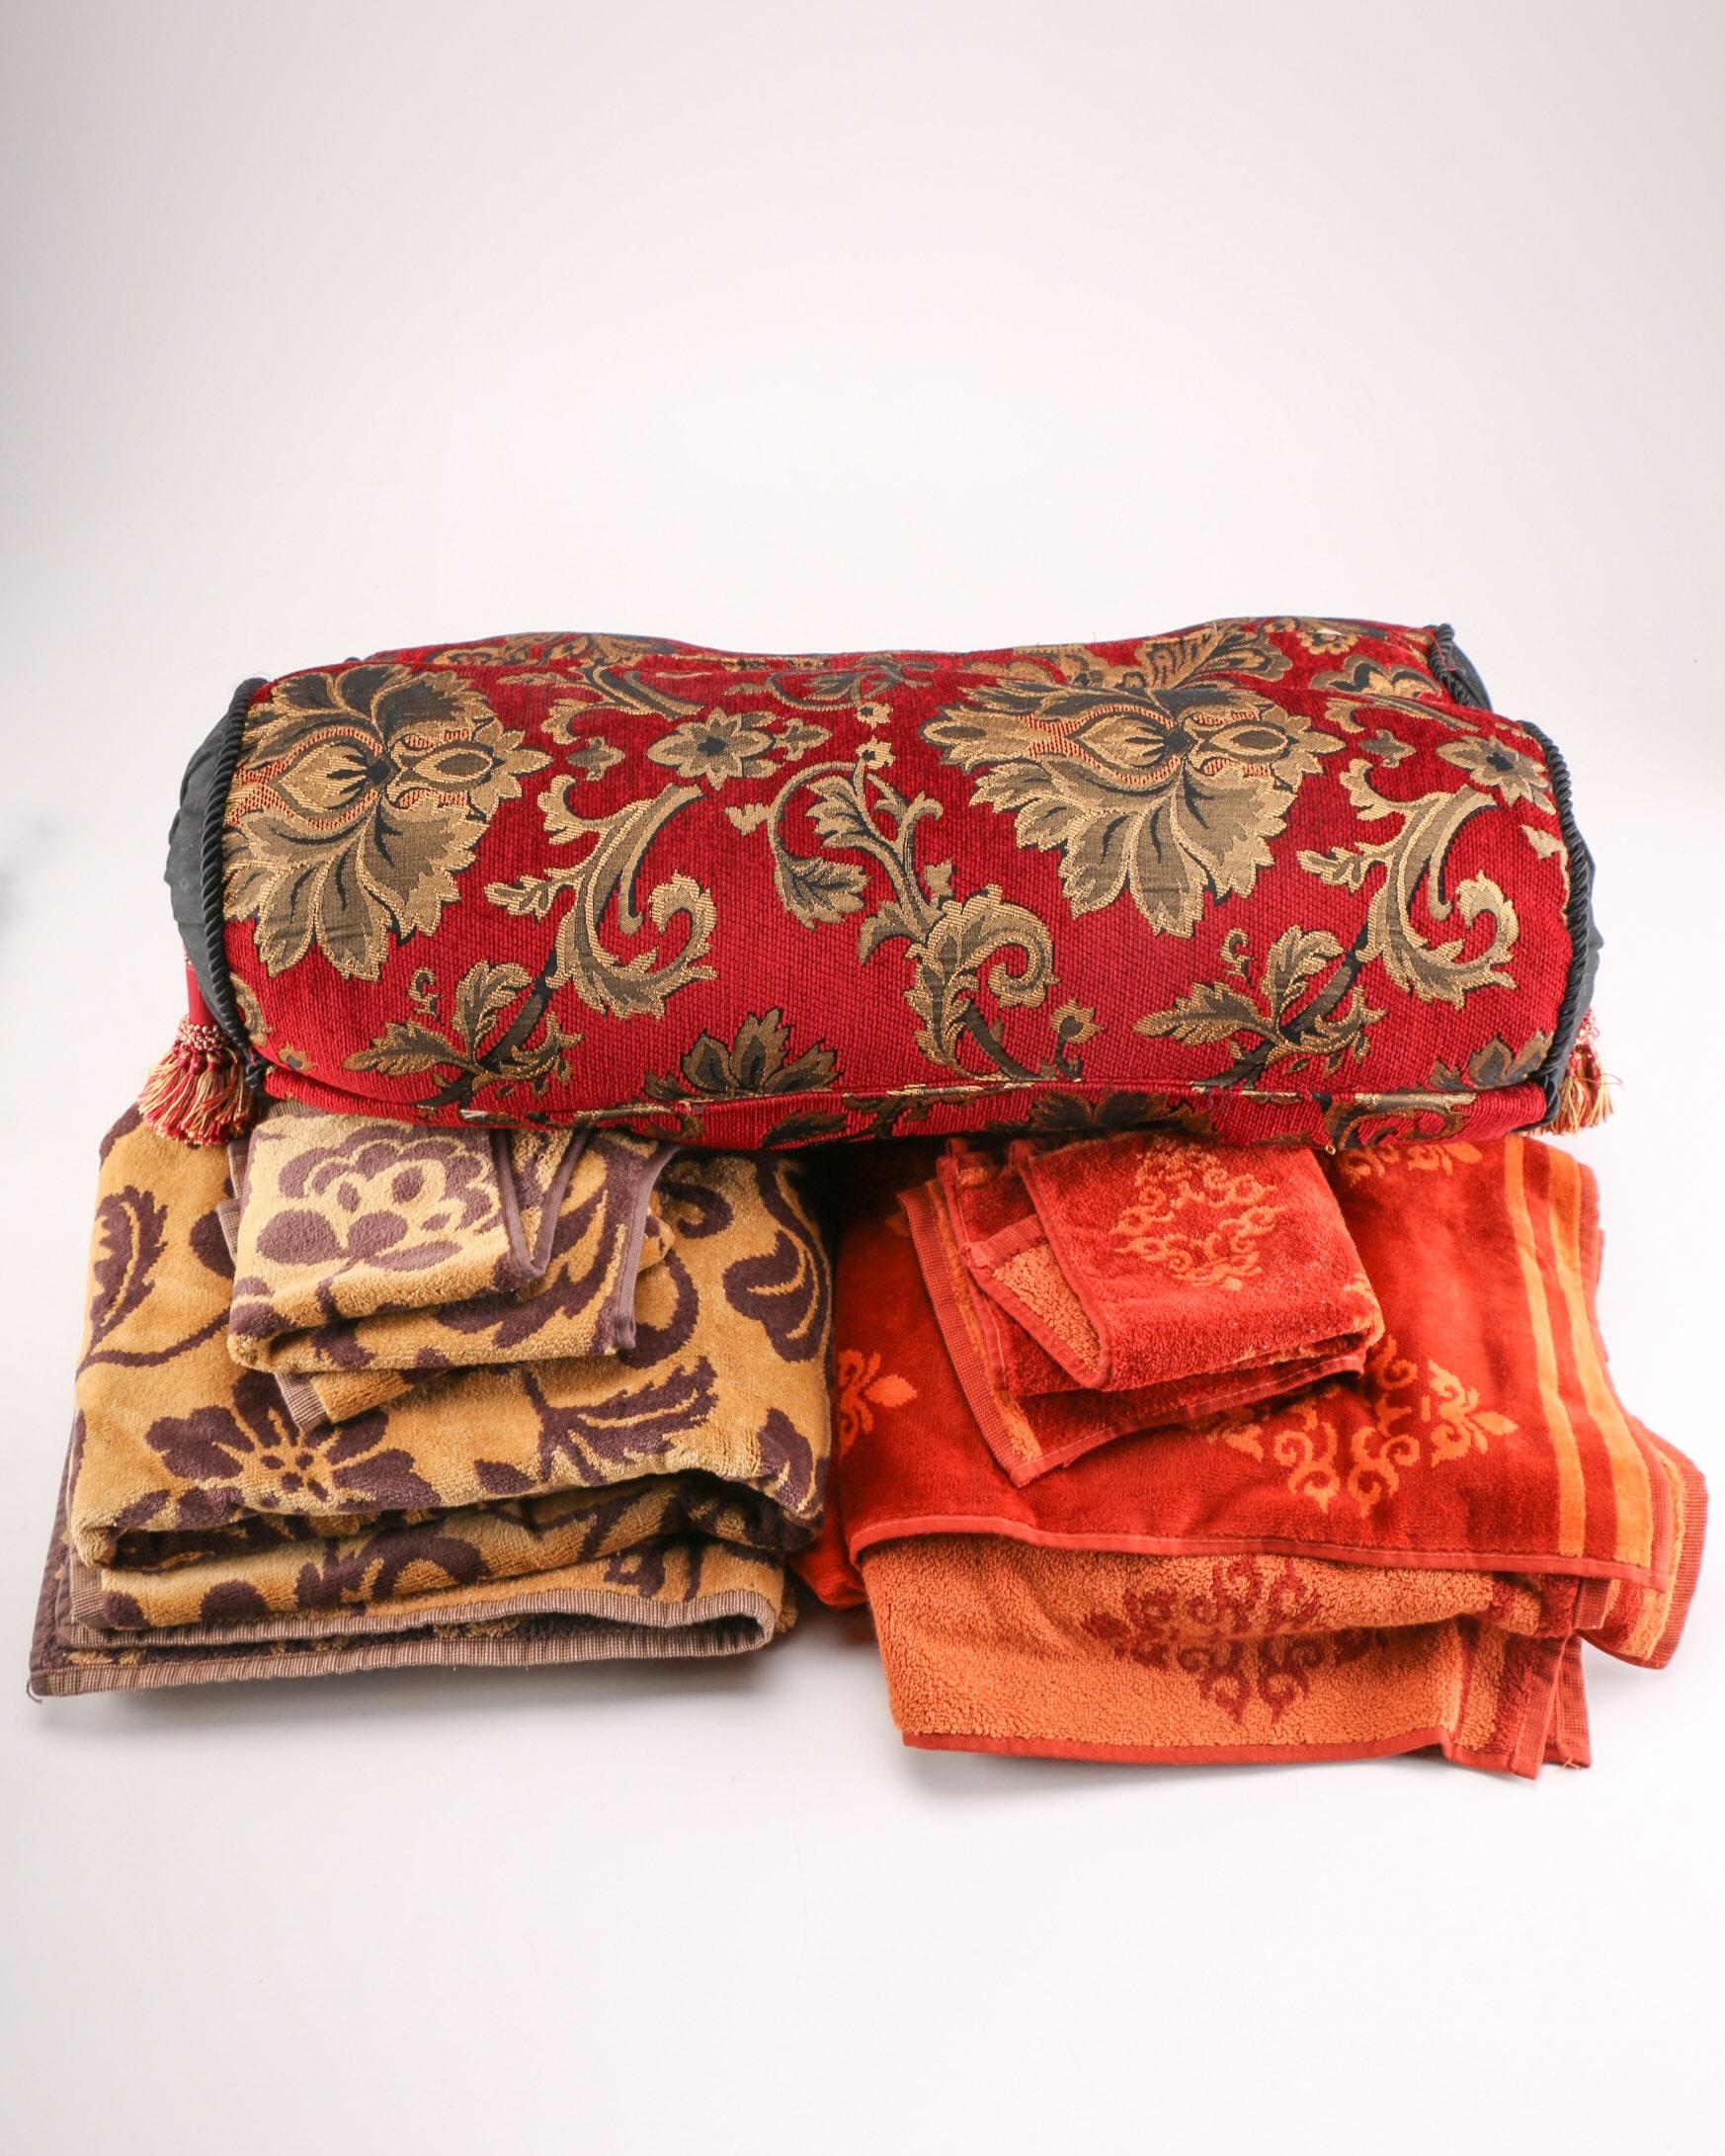 Bath Set and Bolster Pillows